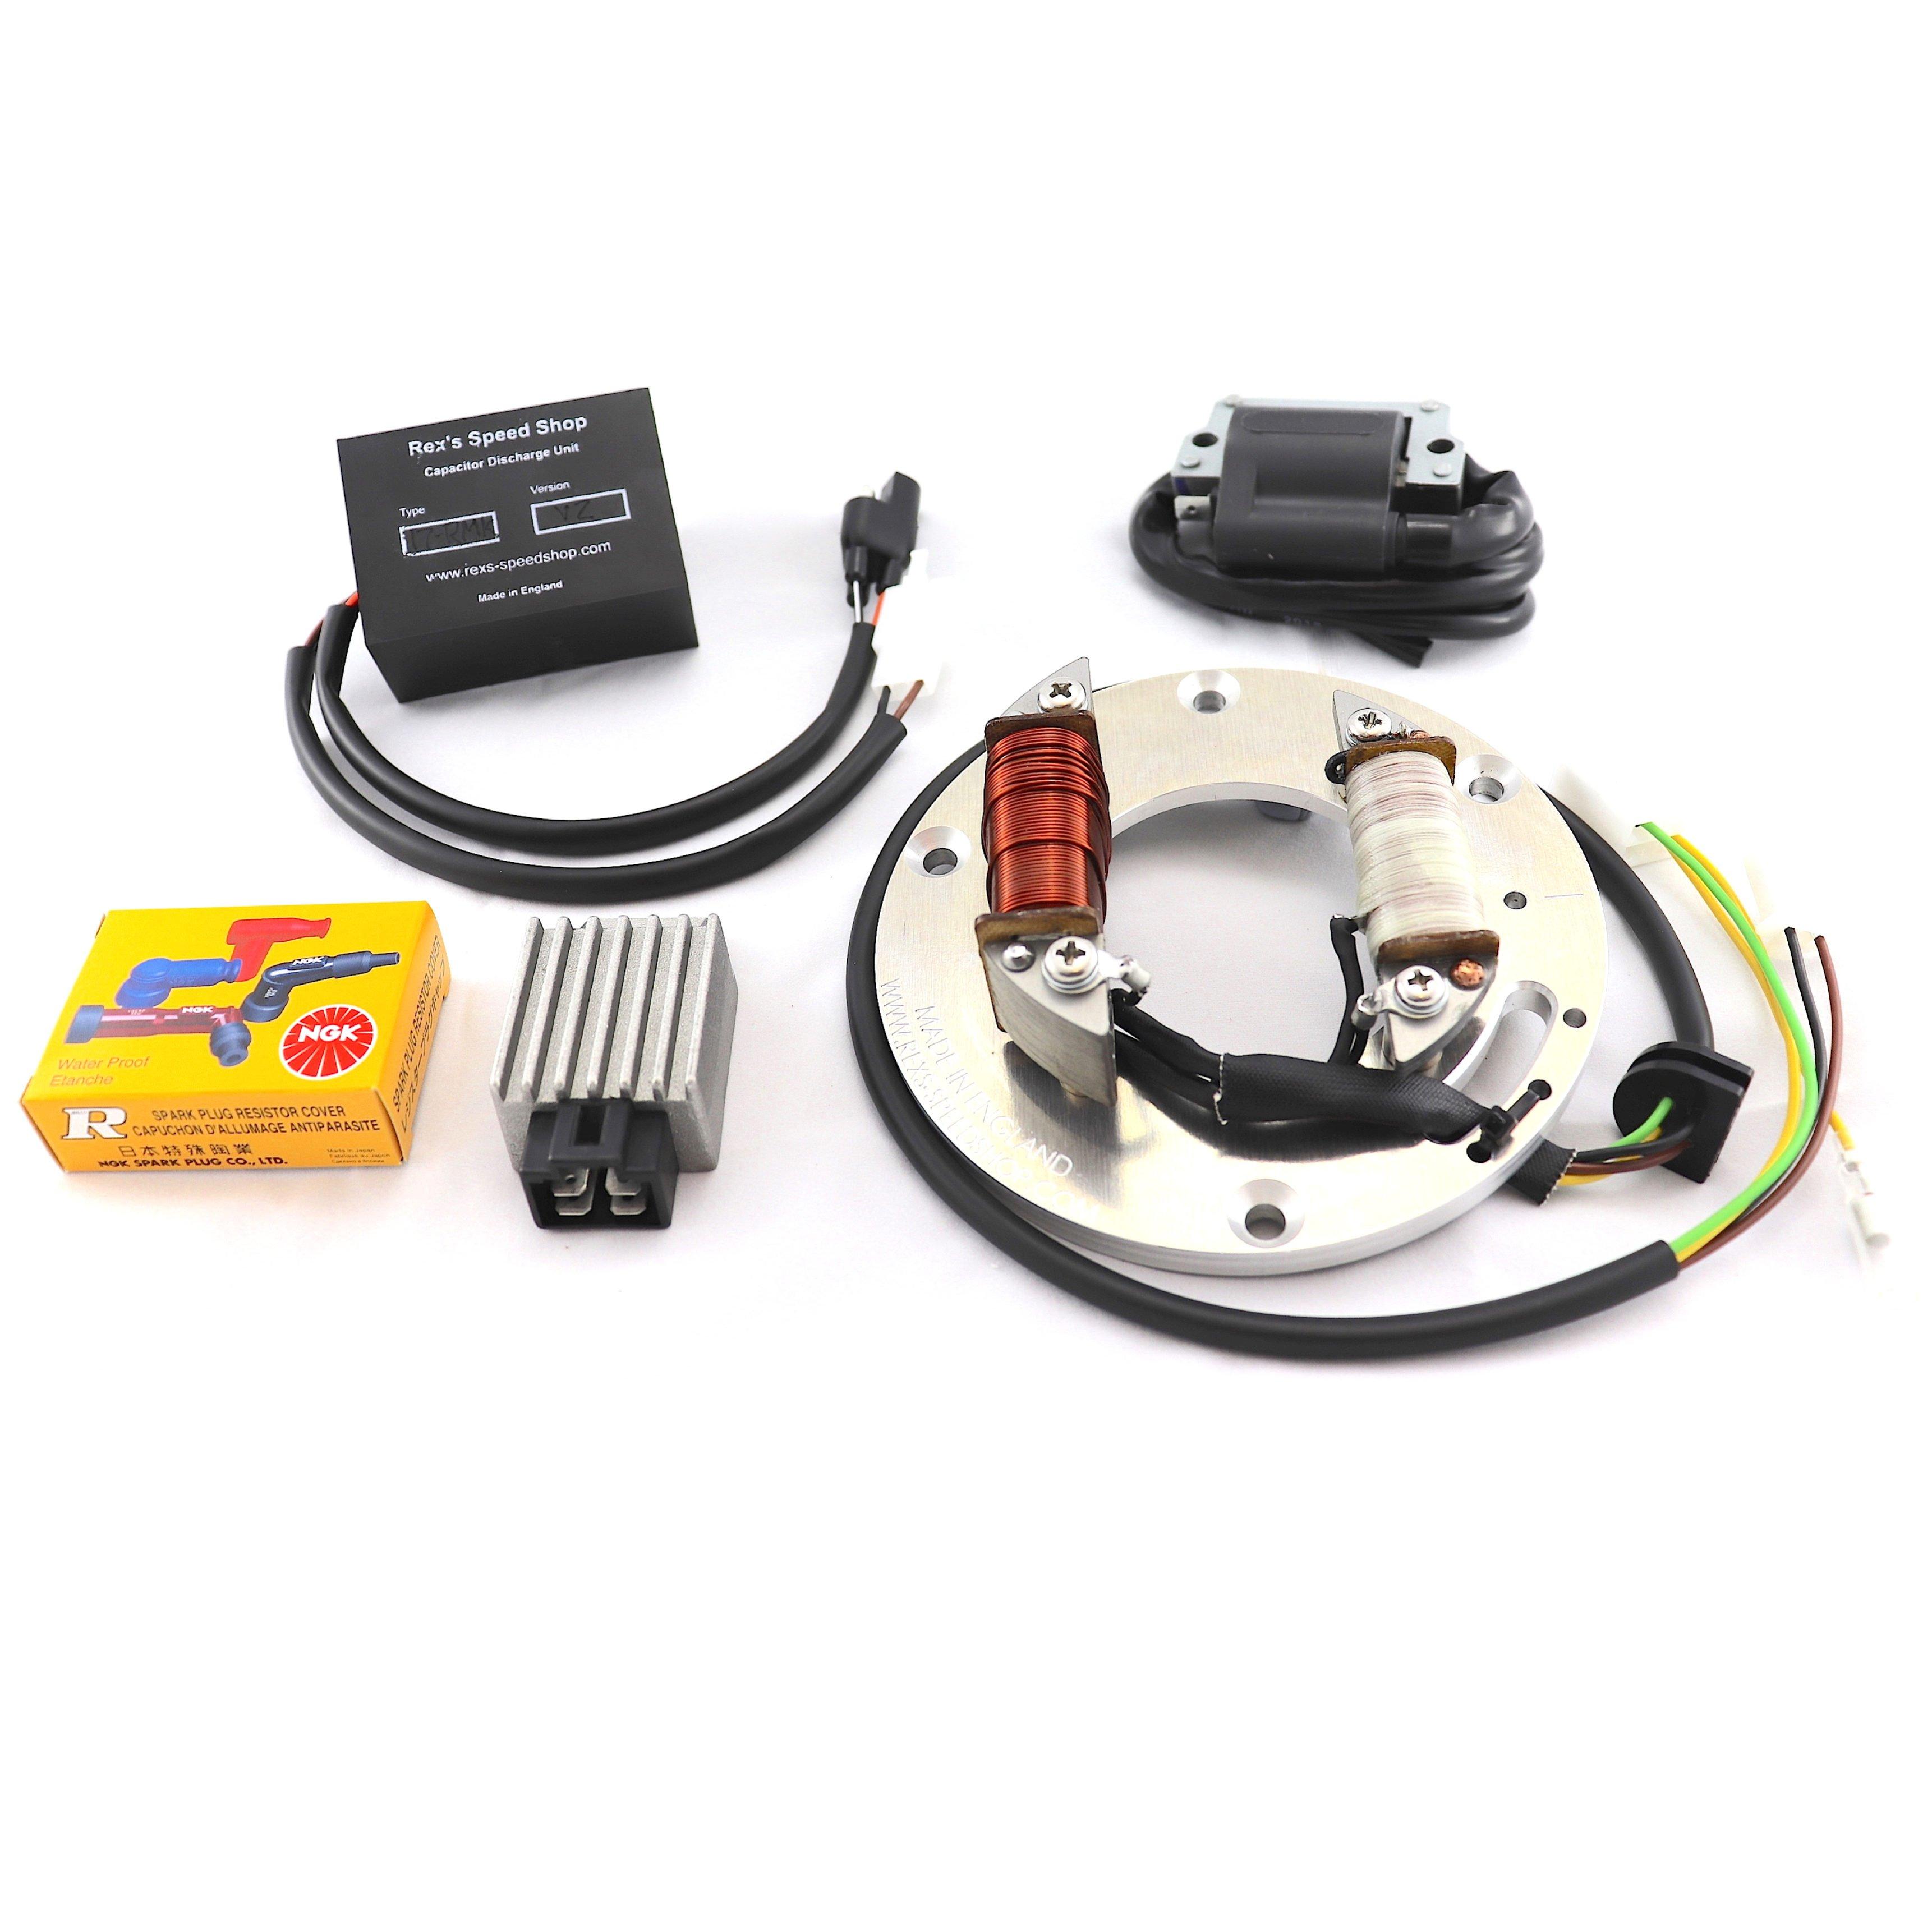 12 Volt Roadster DT360, DT400 B&C Electronic Ignition Yamaha Dt Wiring Diagram on